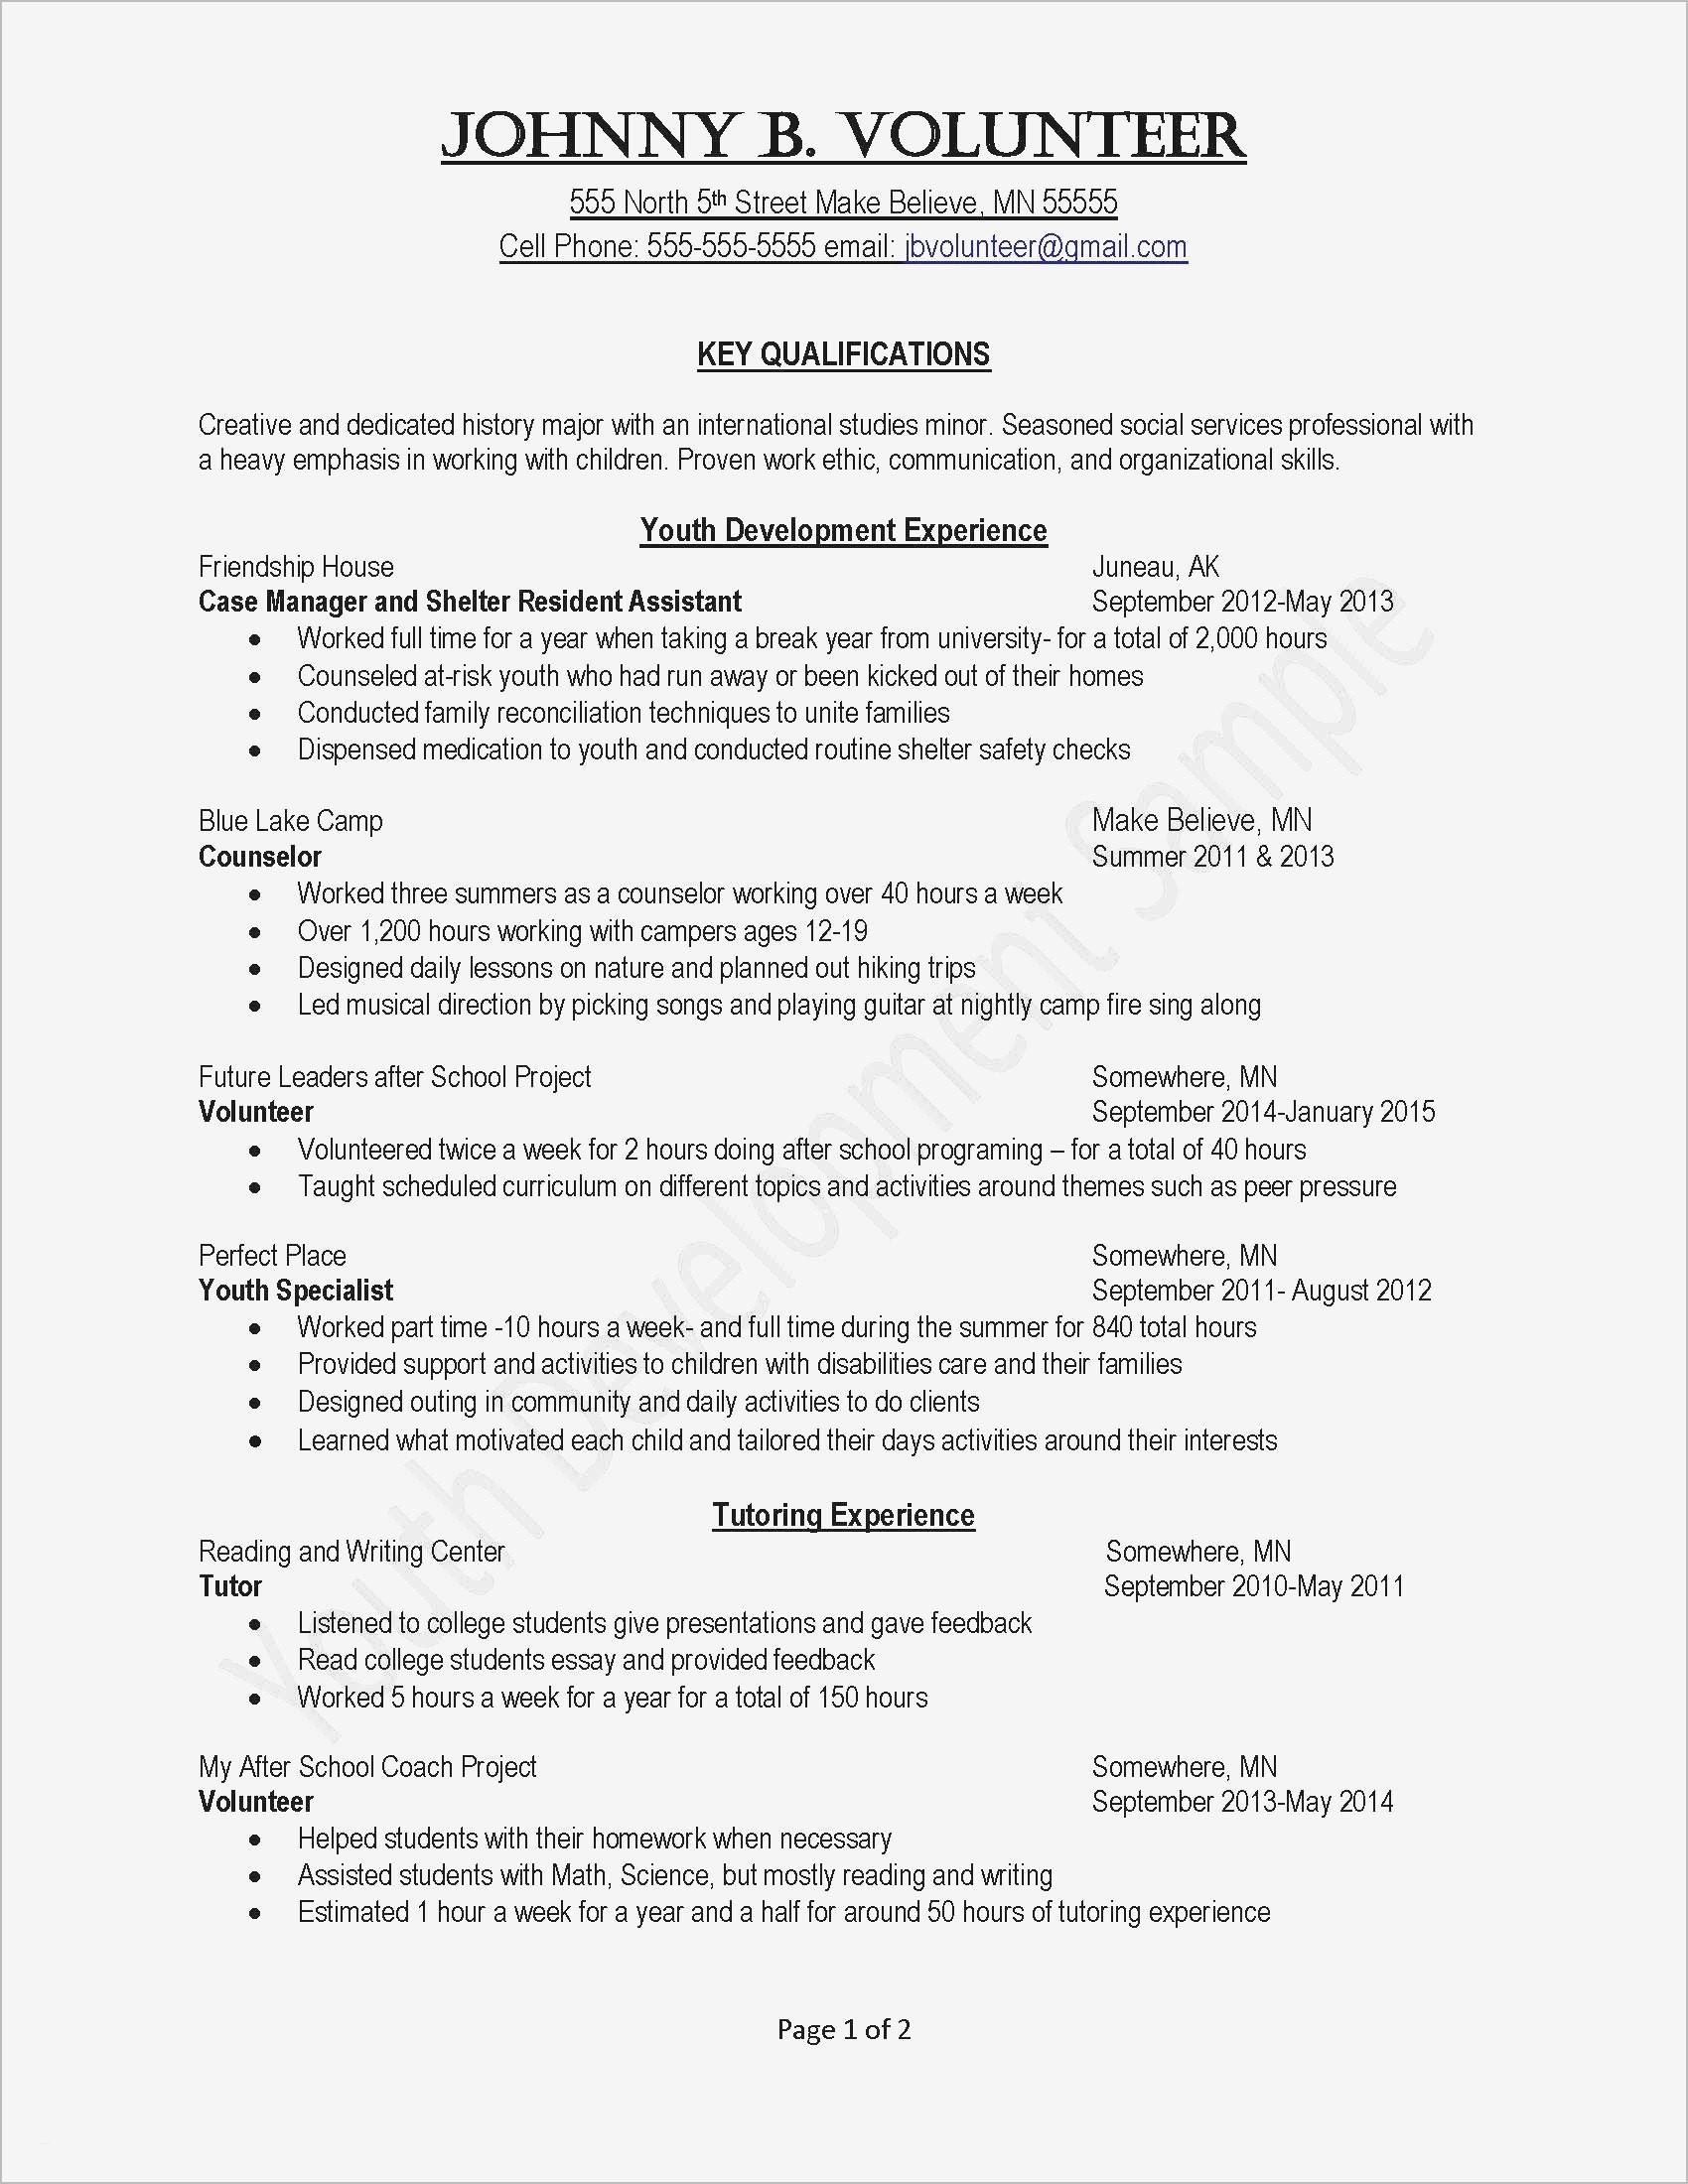 Cover Letter Template Mac - Resume Cover Letter format Beautiful Lovely Job Fer Letter Template